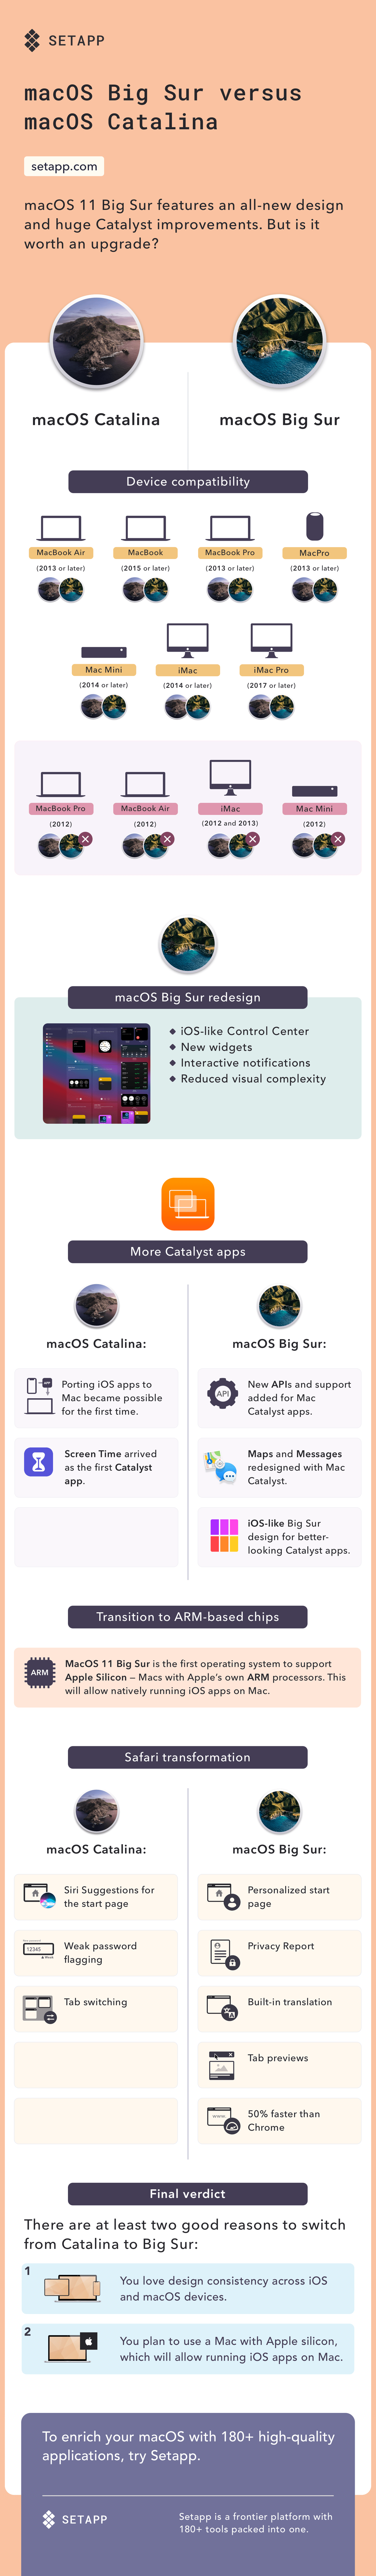 macOS Big Sur vs macOS Catalina infographic